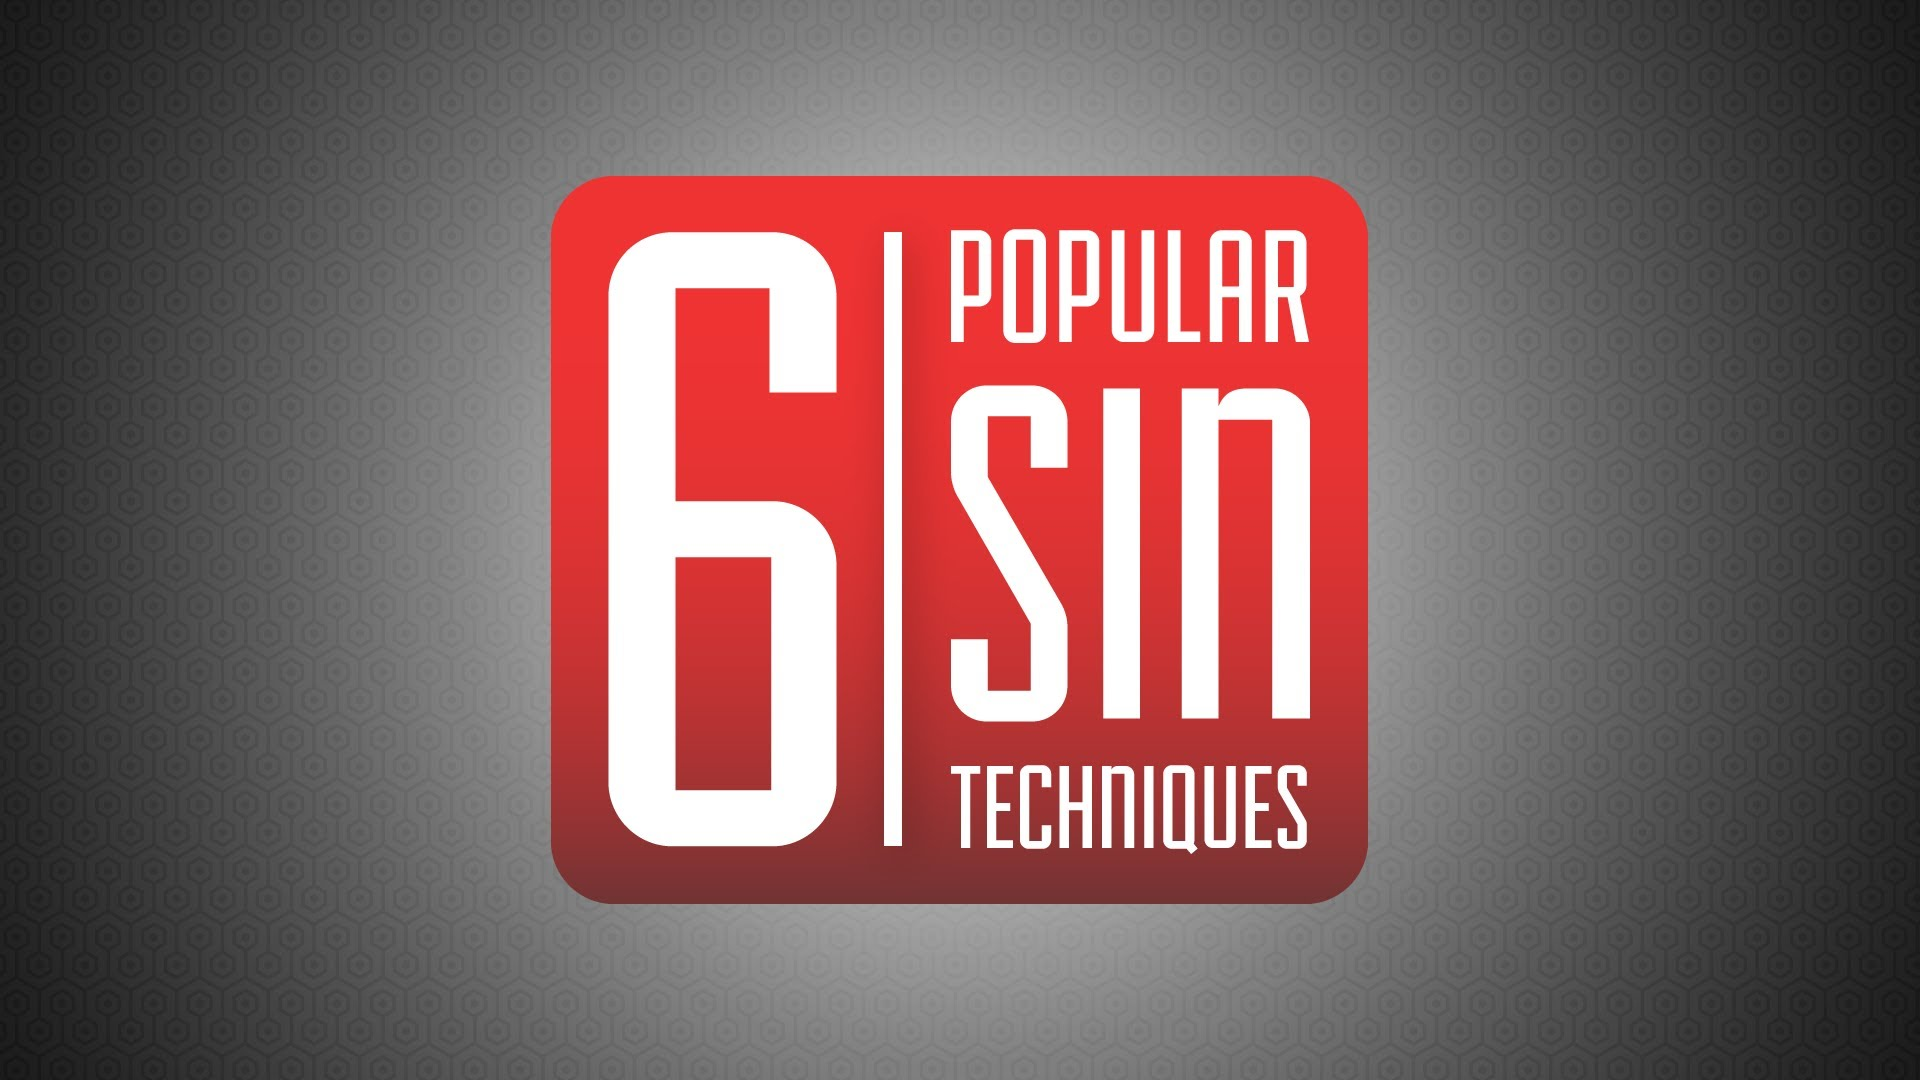 6 Popular Sin Techniques